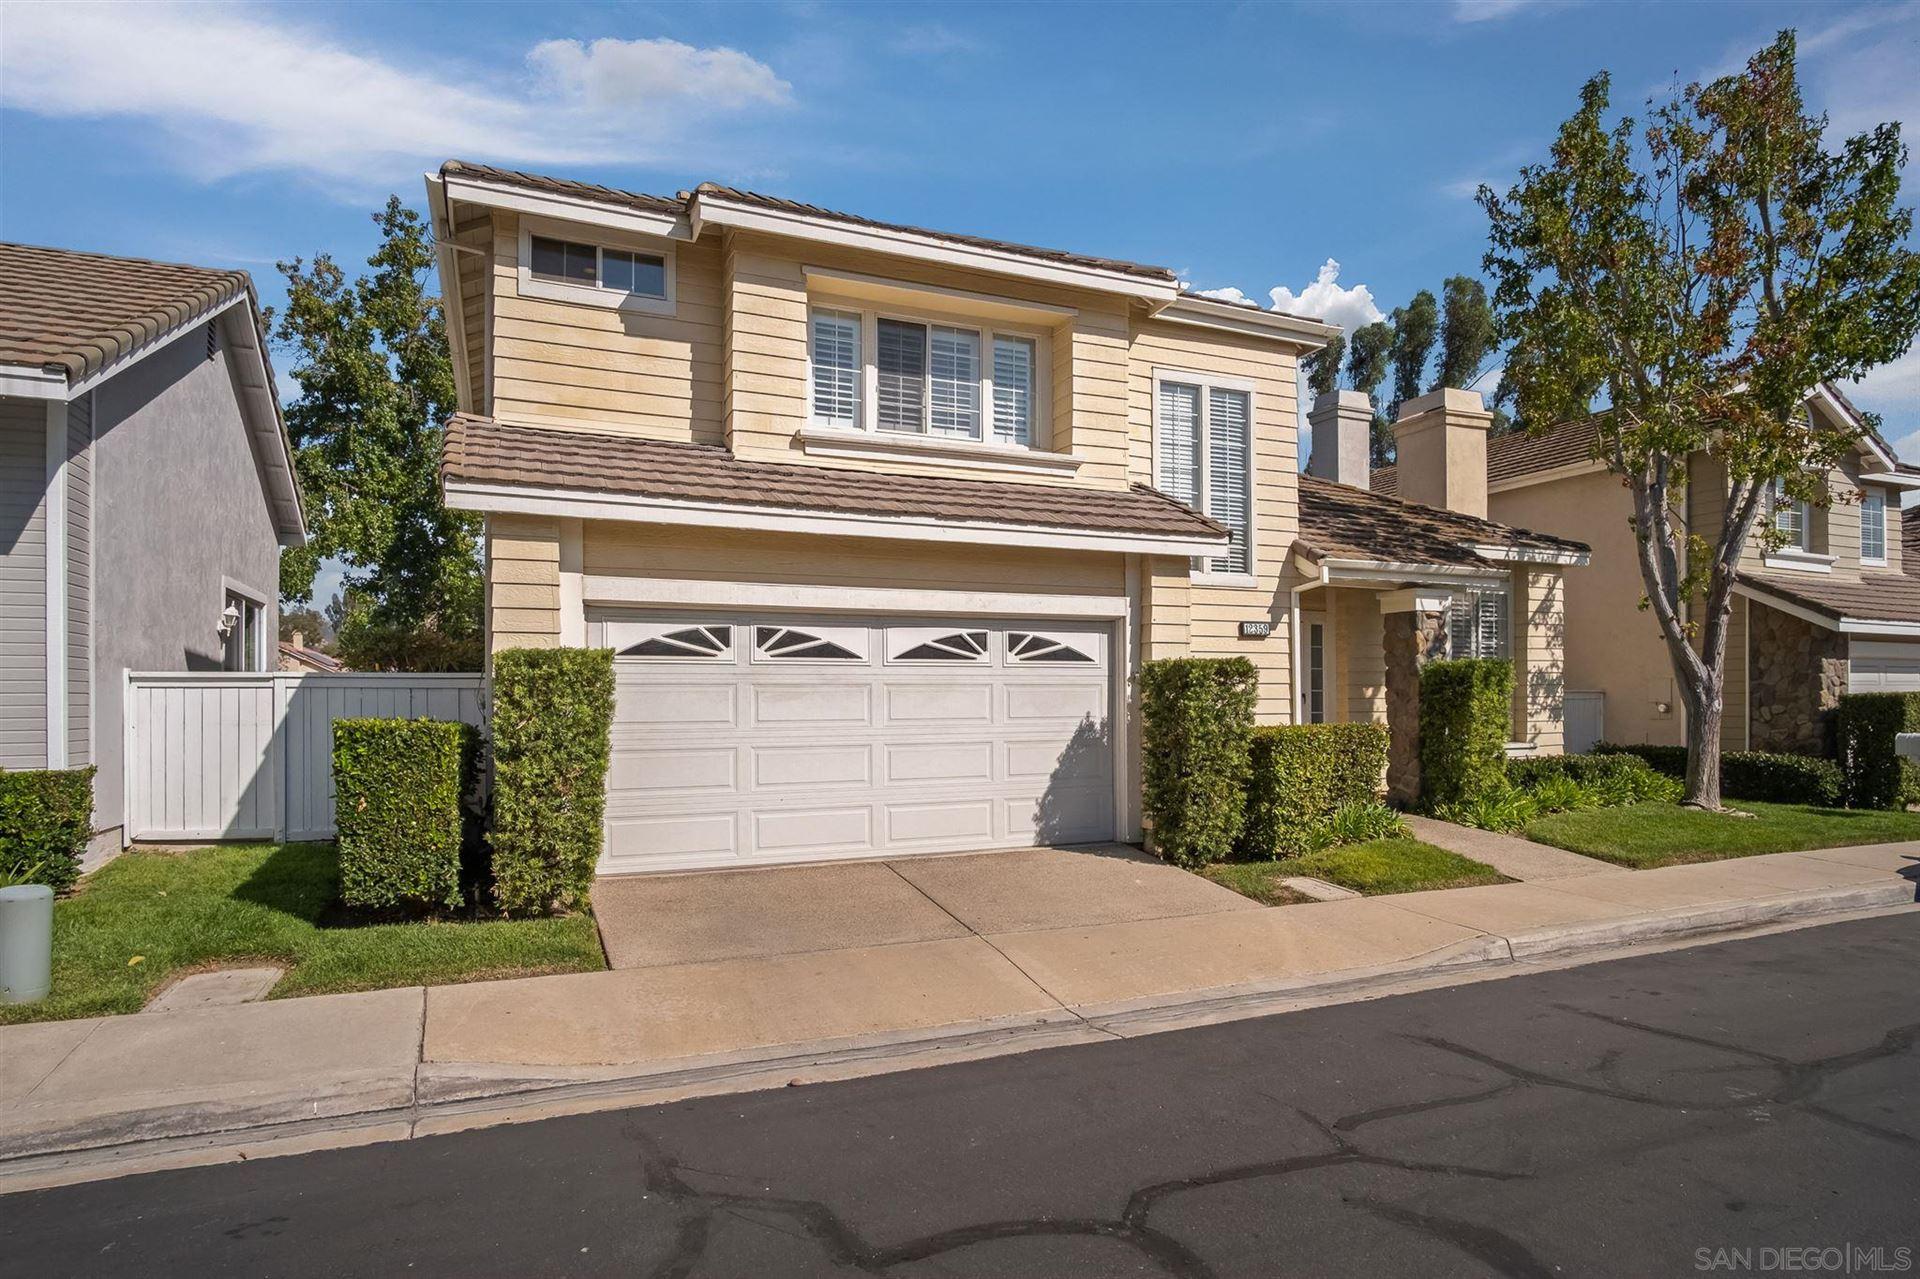 Photo of 12359 Cornwalls Sq, San Diego, CA 92128 (MLS # 200046991)